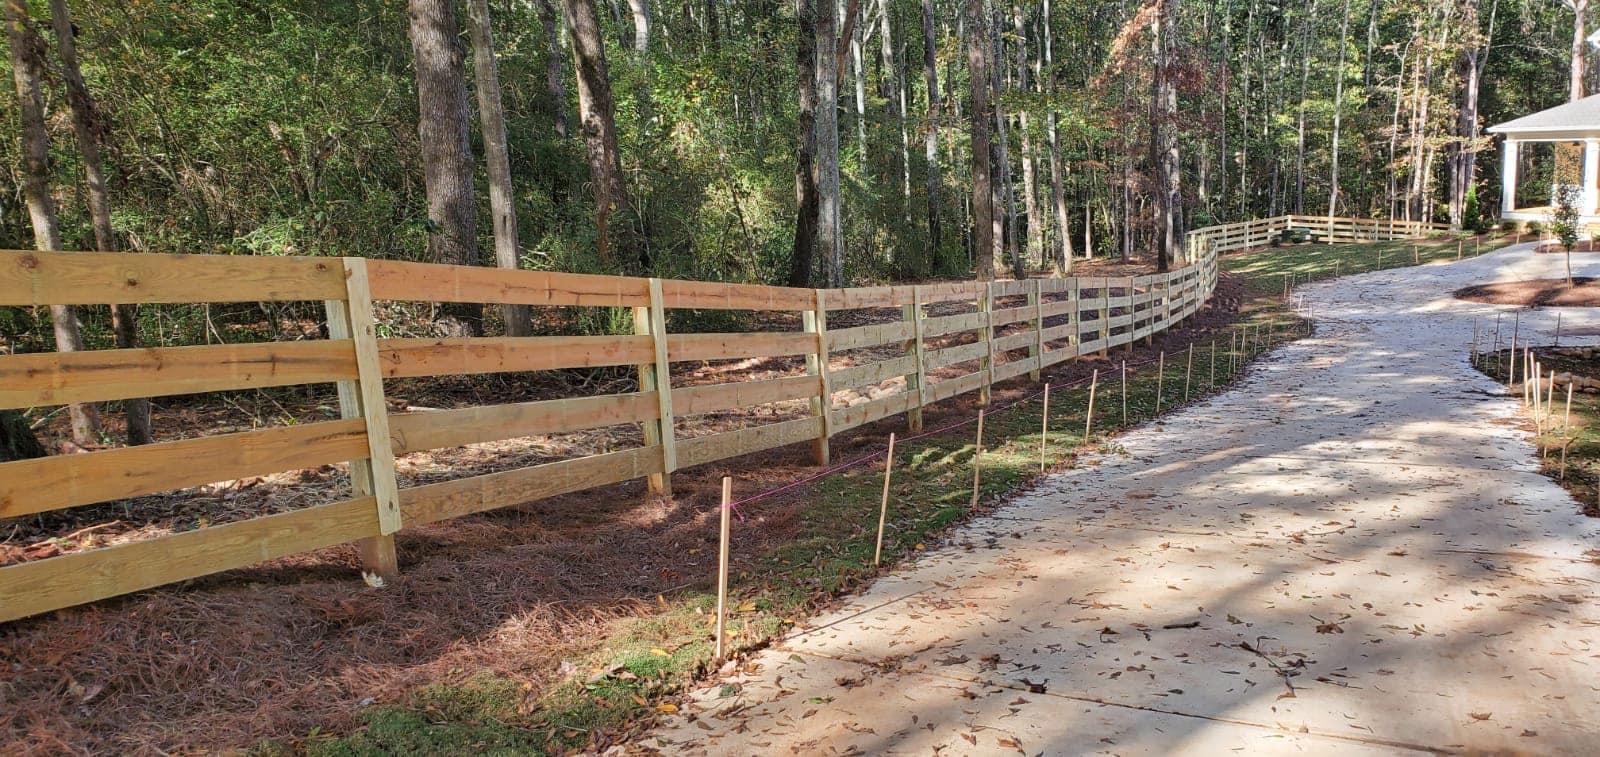 4 rough board fence